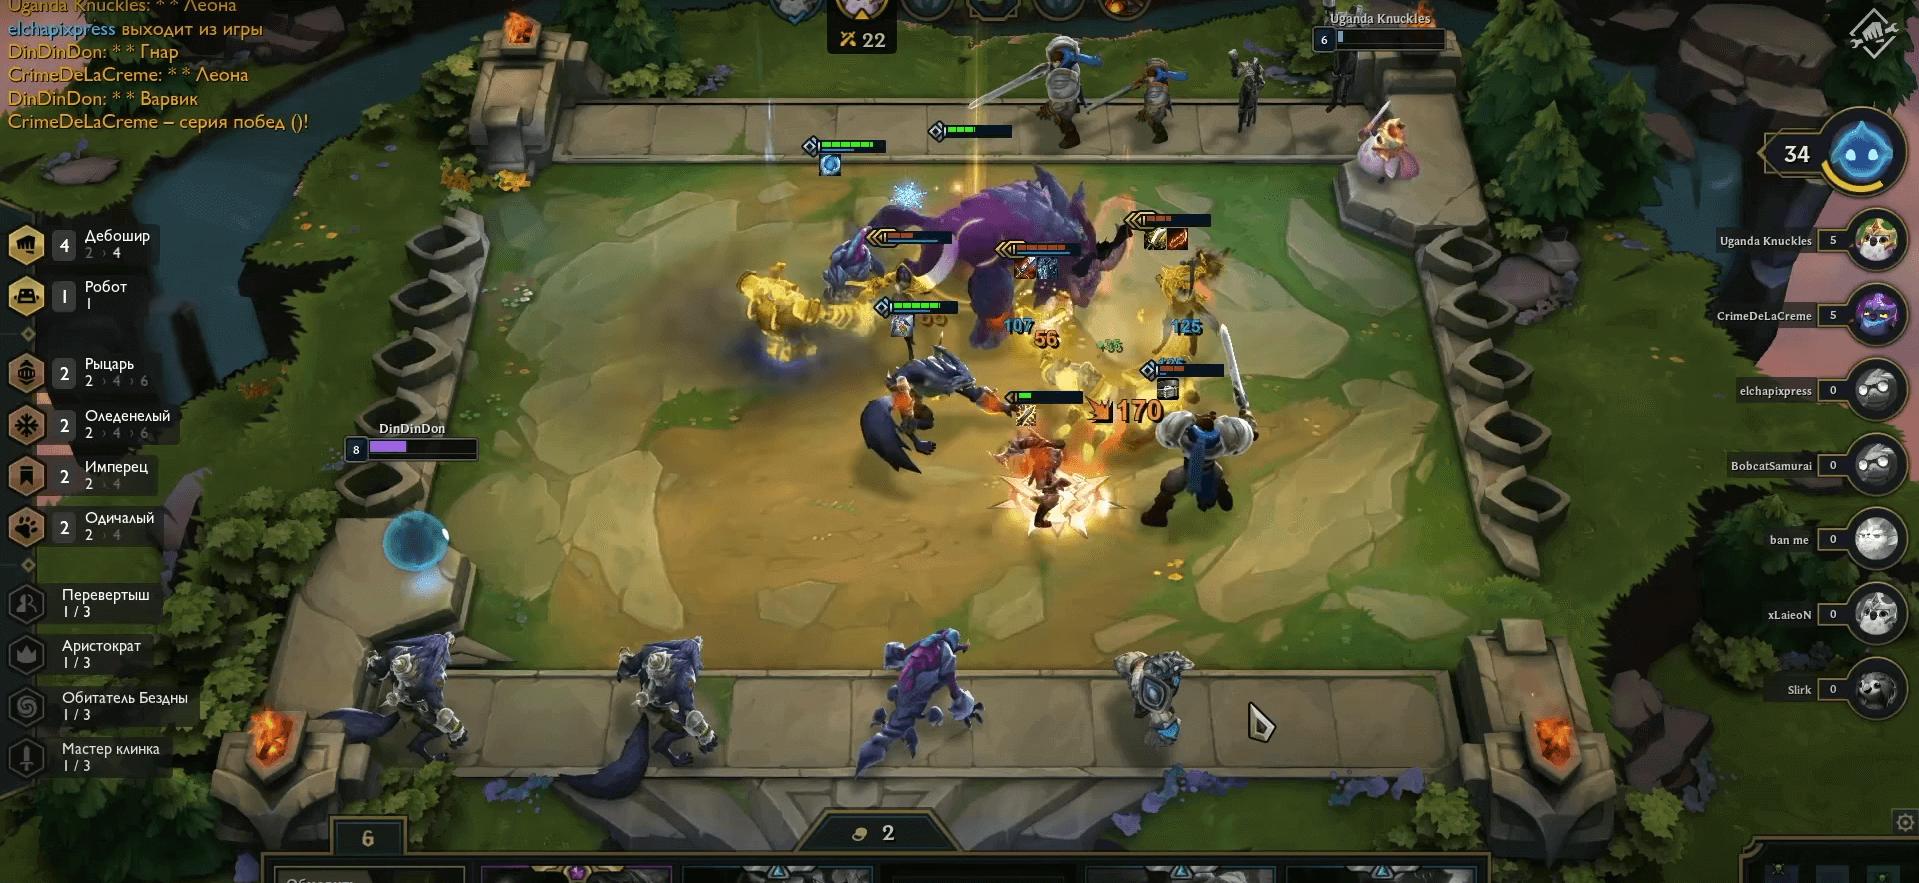 Обозреваем teamgight tactics